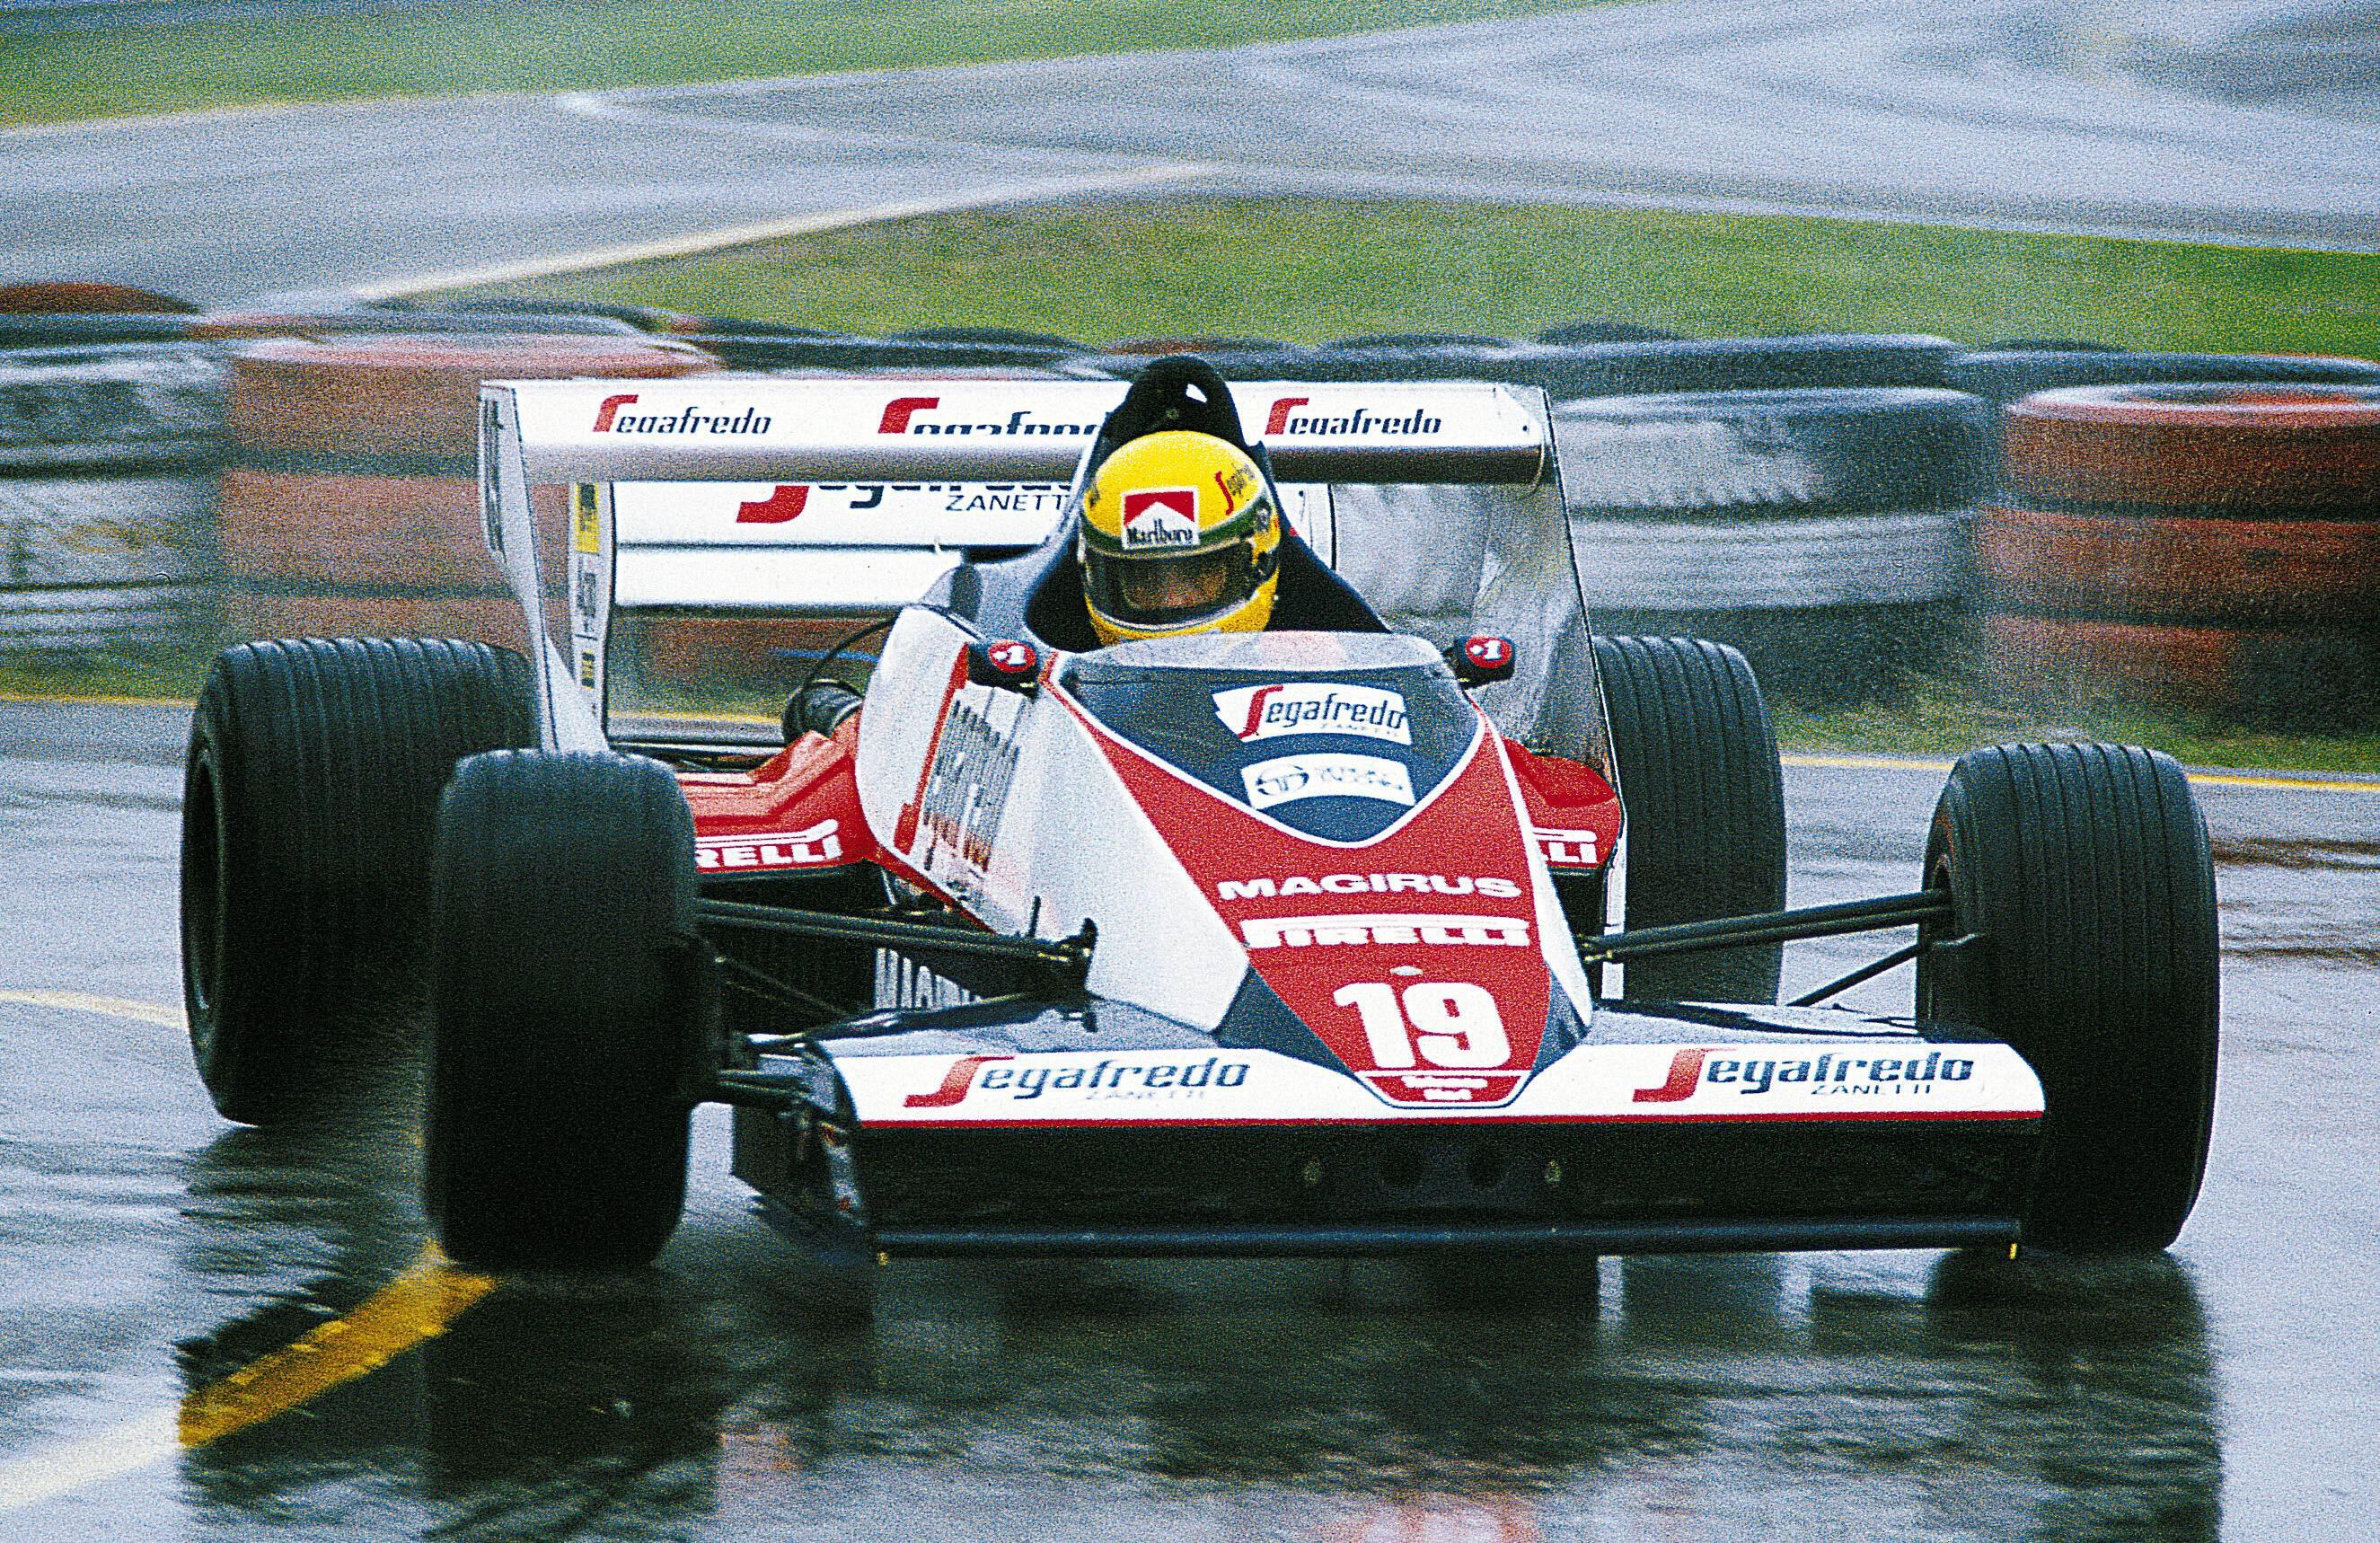 Bild zu Ayrton Senna, Toleman, Hart, Toleman-Hart, Formel 1, Regen